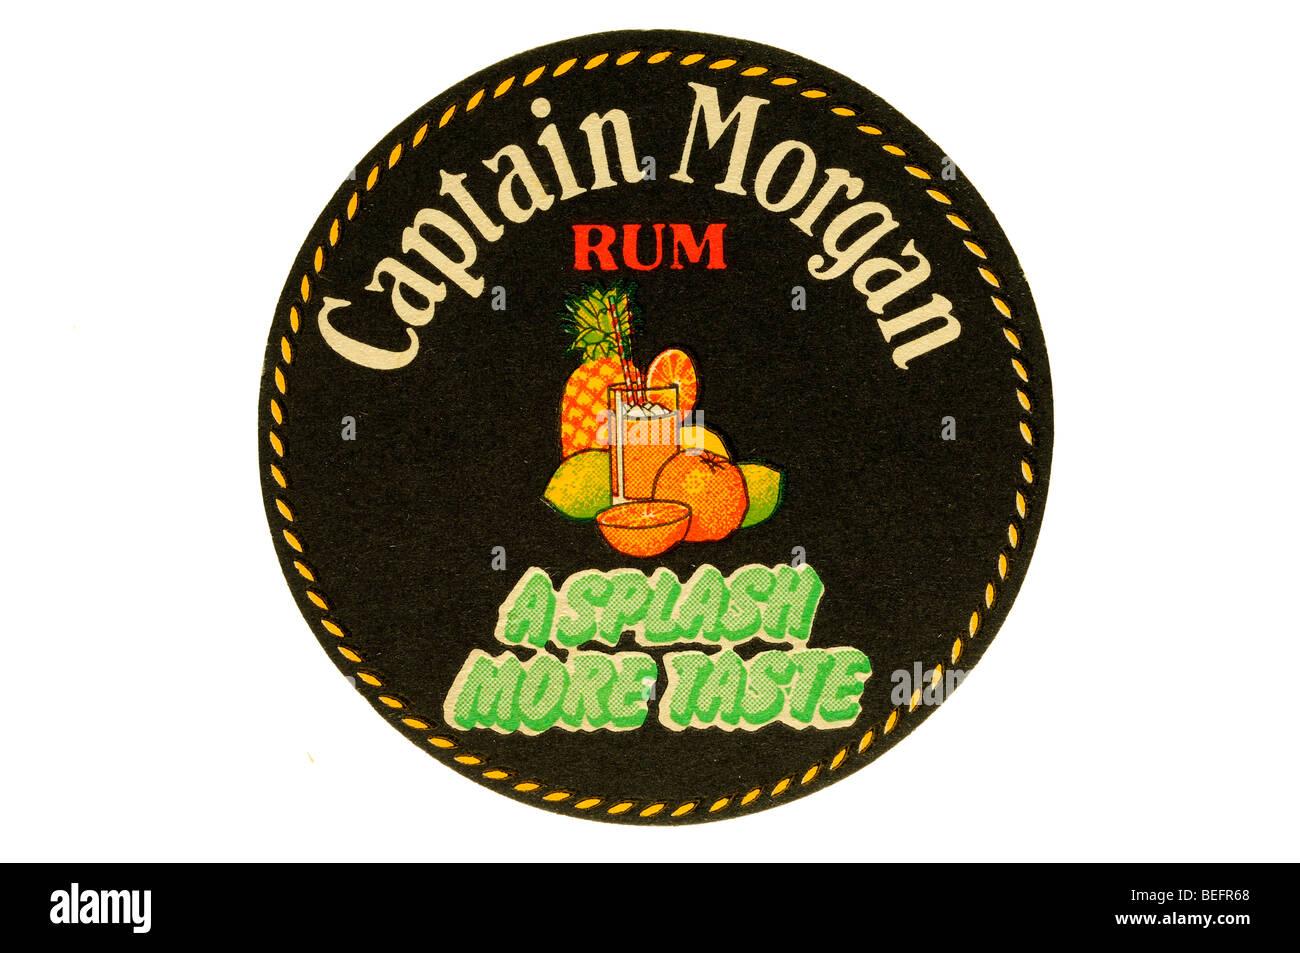 captain morgan rum a splash more taste - Stock Image